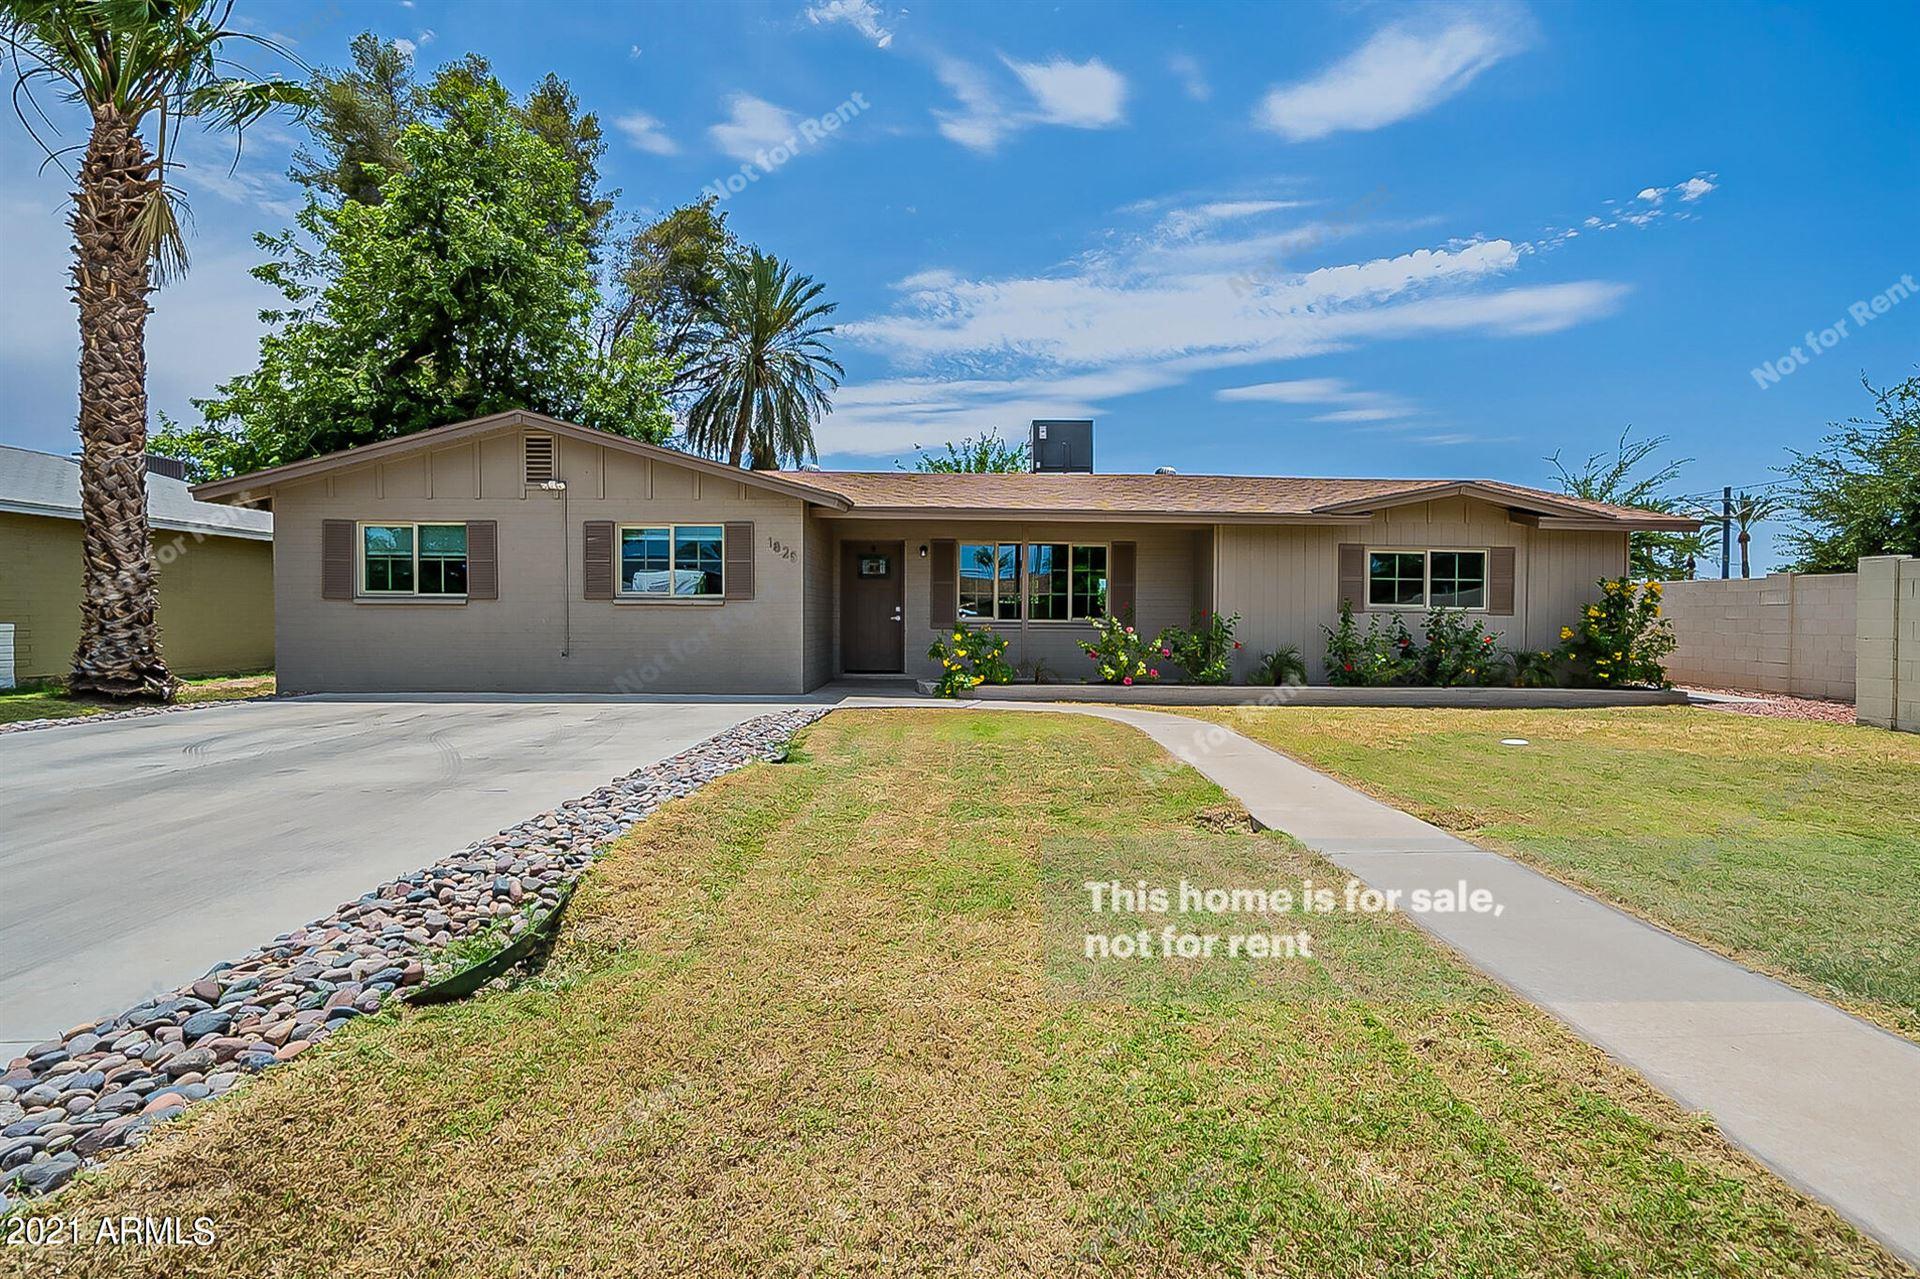 1825 W VISTA Avenue, Phoenix, AZ 85021 - MLS#: 6246923